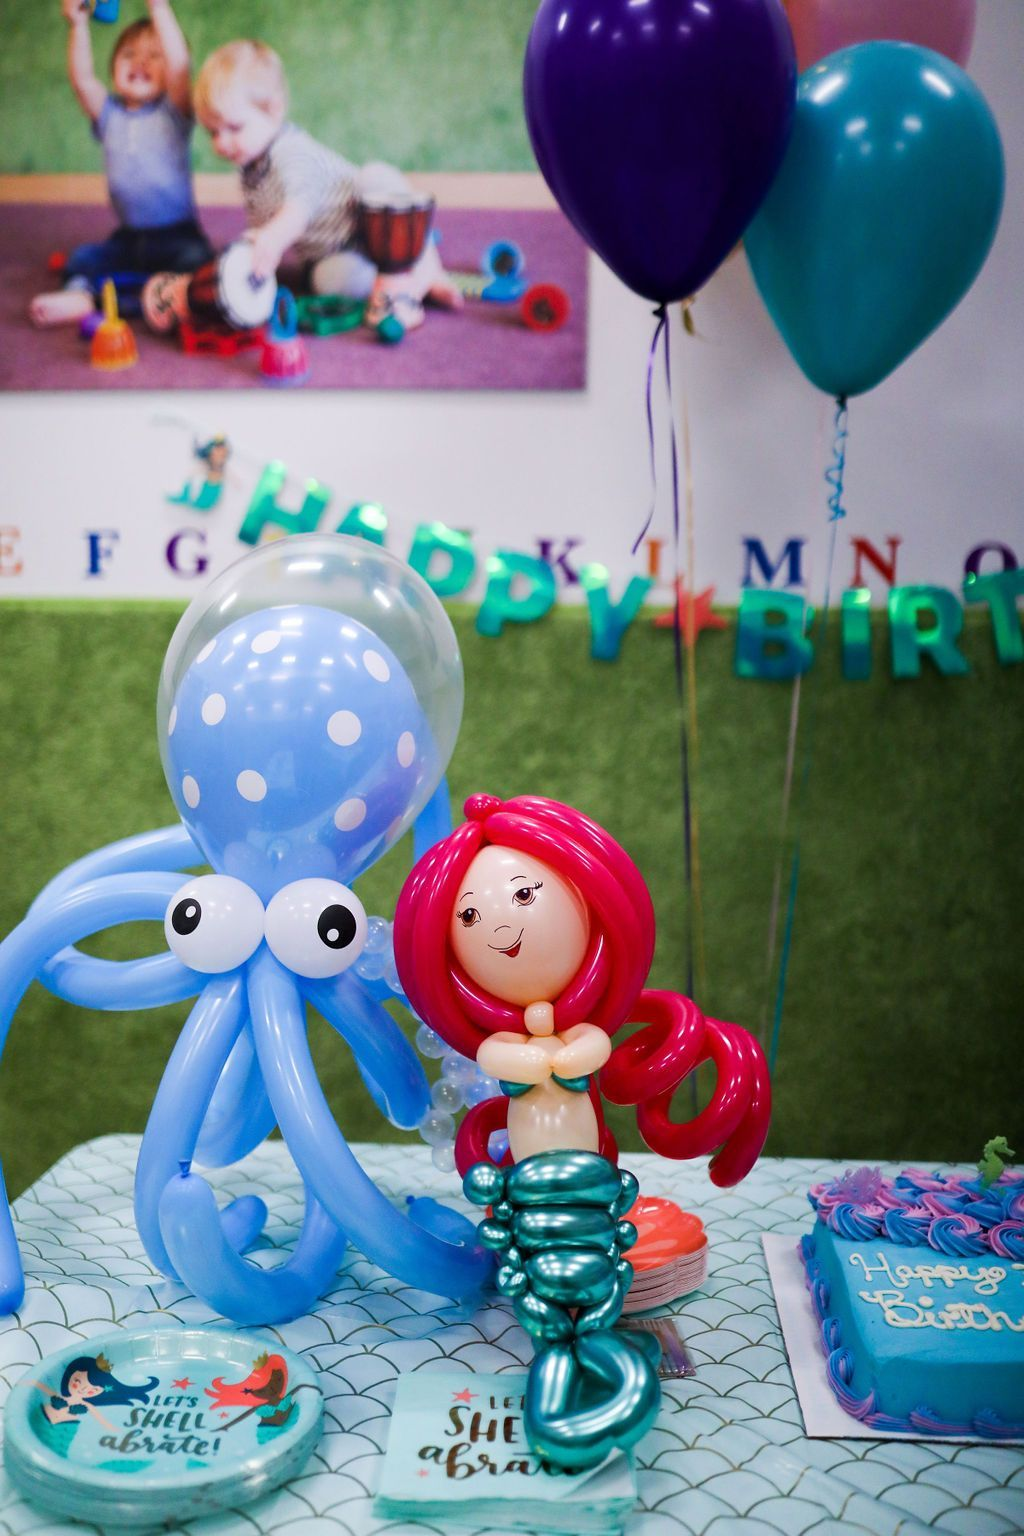 Elles mermaid themed 3rd birthday party gold coast girl